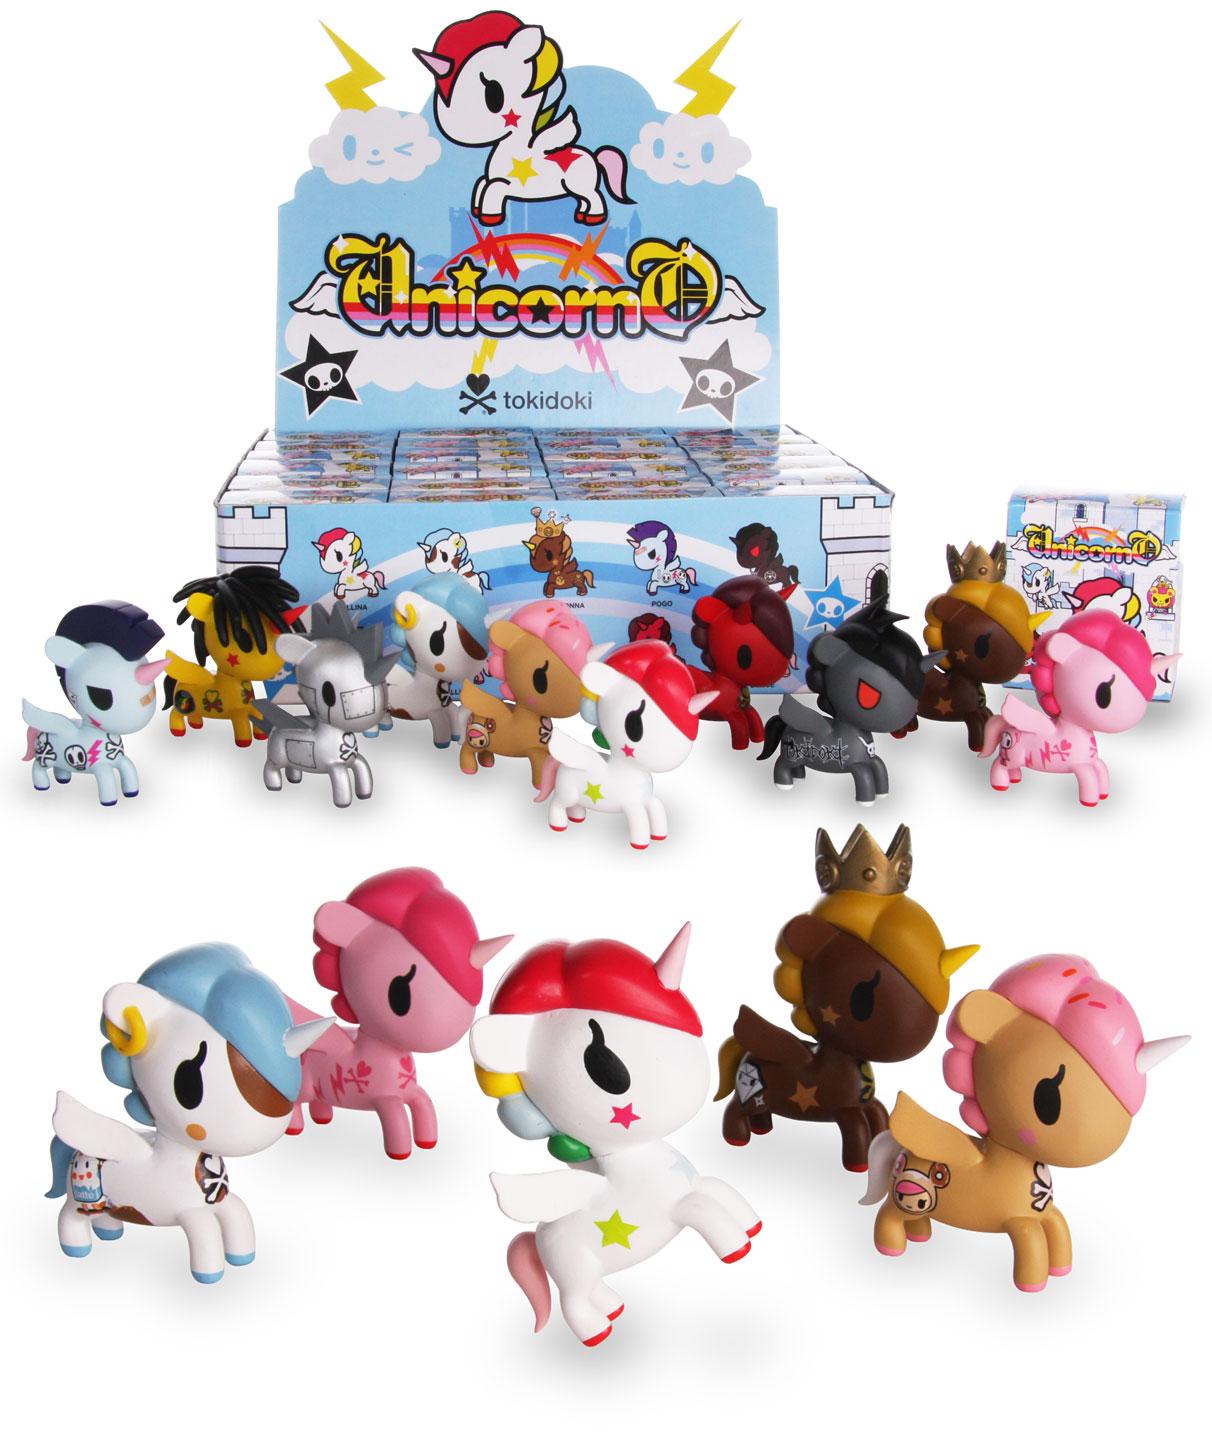 Unicornos Mini Cuteness From Tokidoki